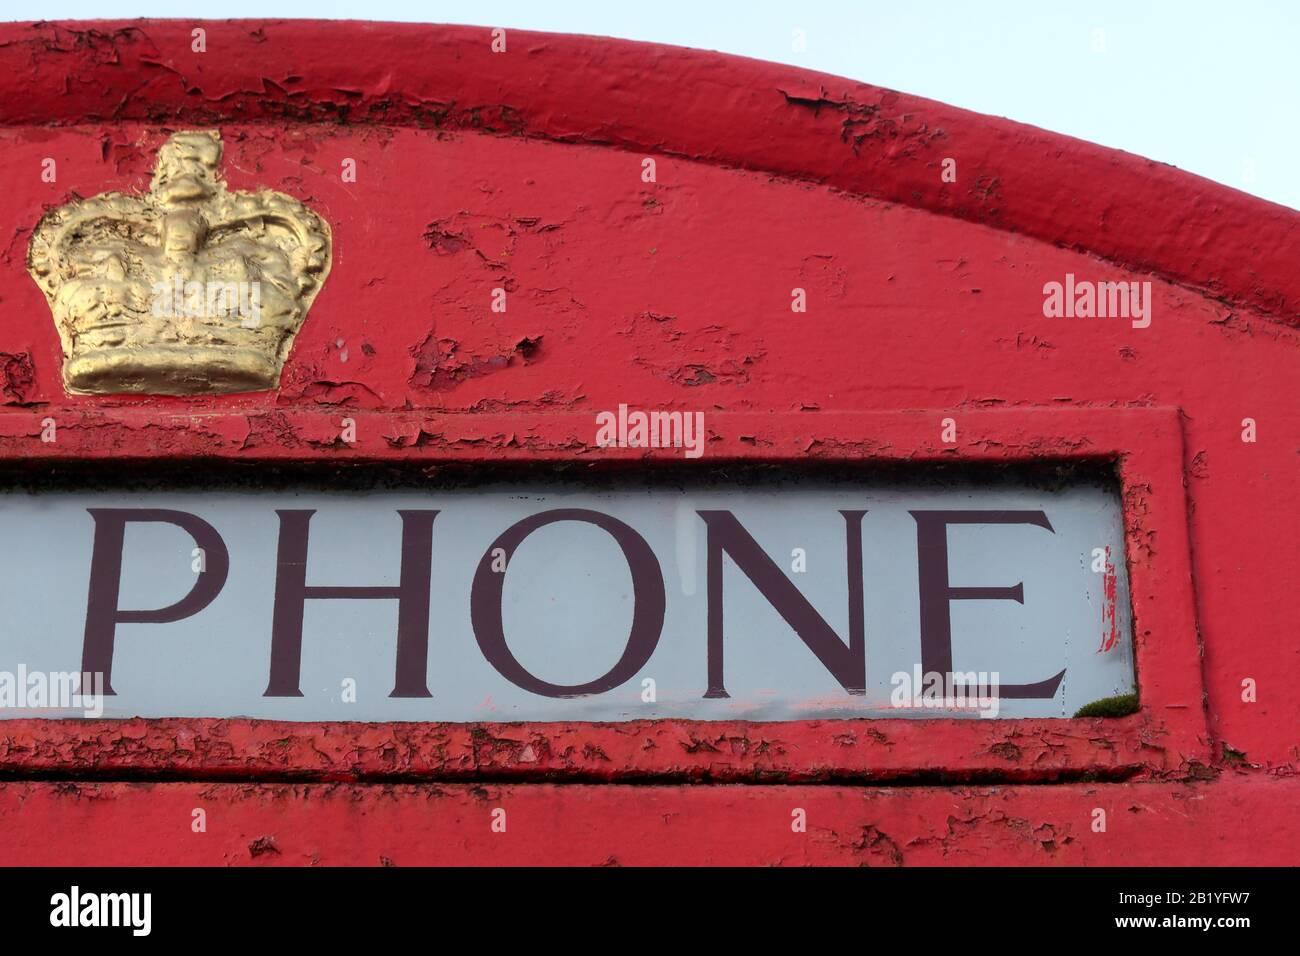 HotpixUK,@HotpixUK,GoTonySmith,UK,England,British,Phone,classic,ER,Crown,post office,telephones,box,booth,red,traditional,public telephone,BT,British Telecom,Post Office Telephones,Sir Giles Gilbert Scott,Giles Gilbert Scott,telecoms,telephony,United Kingdom,British red telephone kiosk,fascia,outside,exterior,icons,British icon,British cultural icon,K2,design icon,1924,competition 1924,K6,K6 public telephone,Tetbury